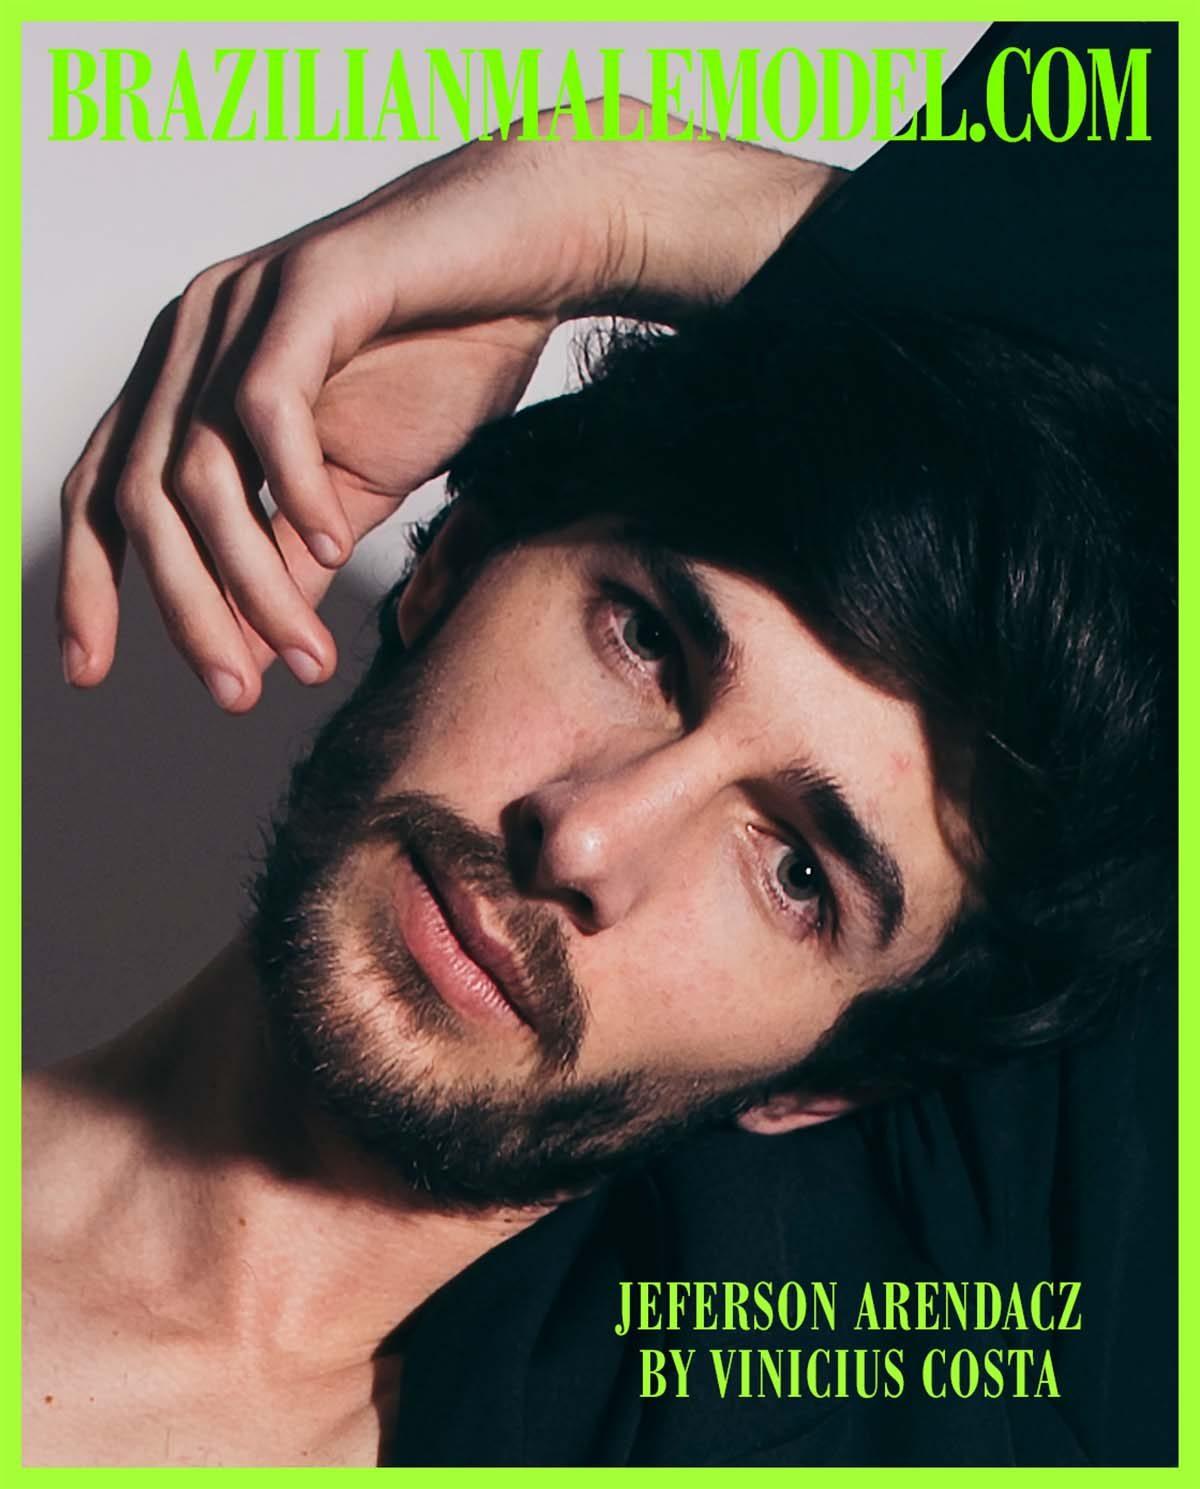 Jeferson Arendacz by Vinicius Costa